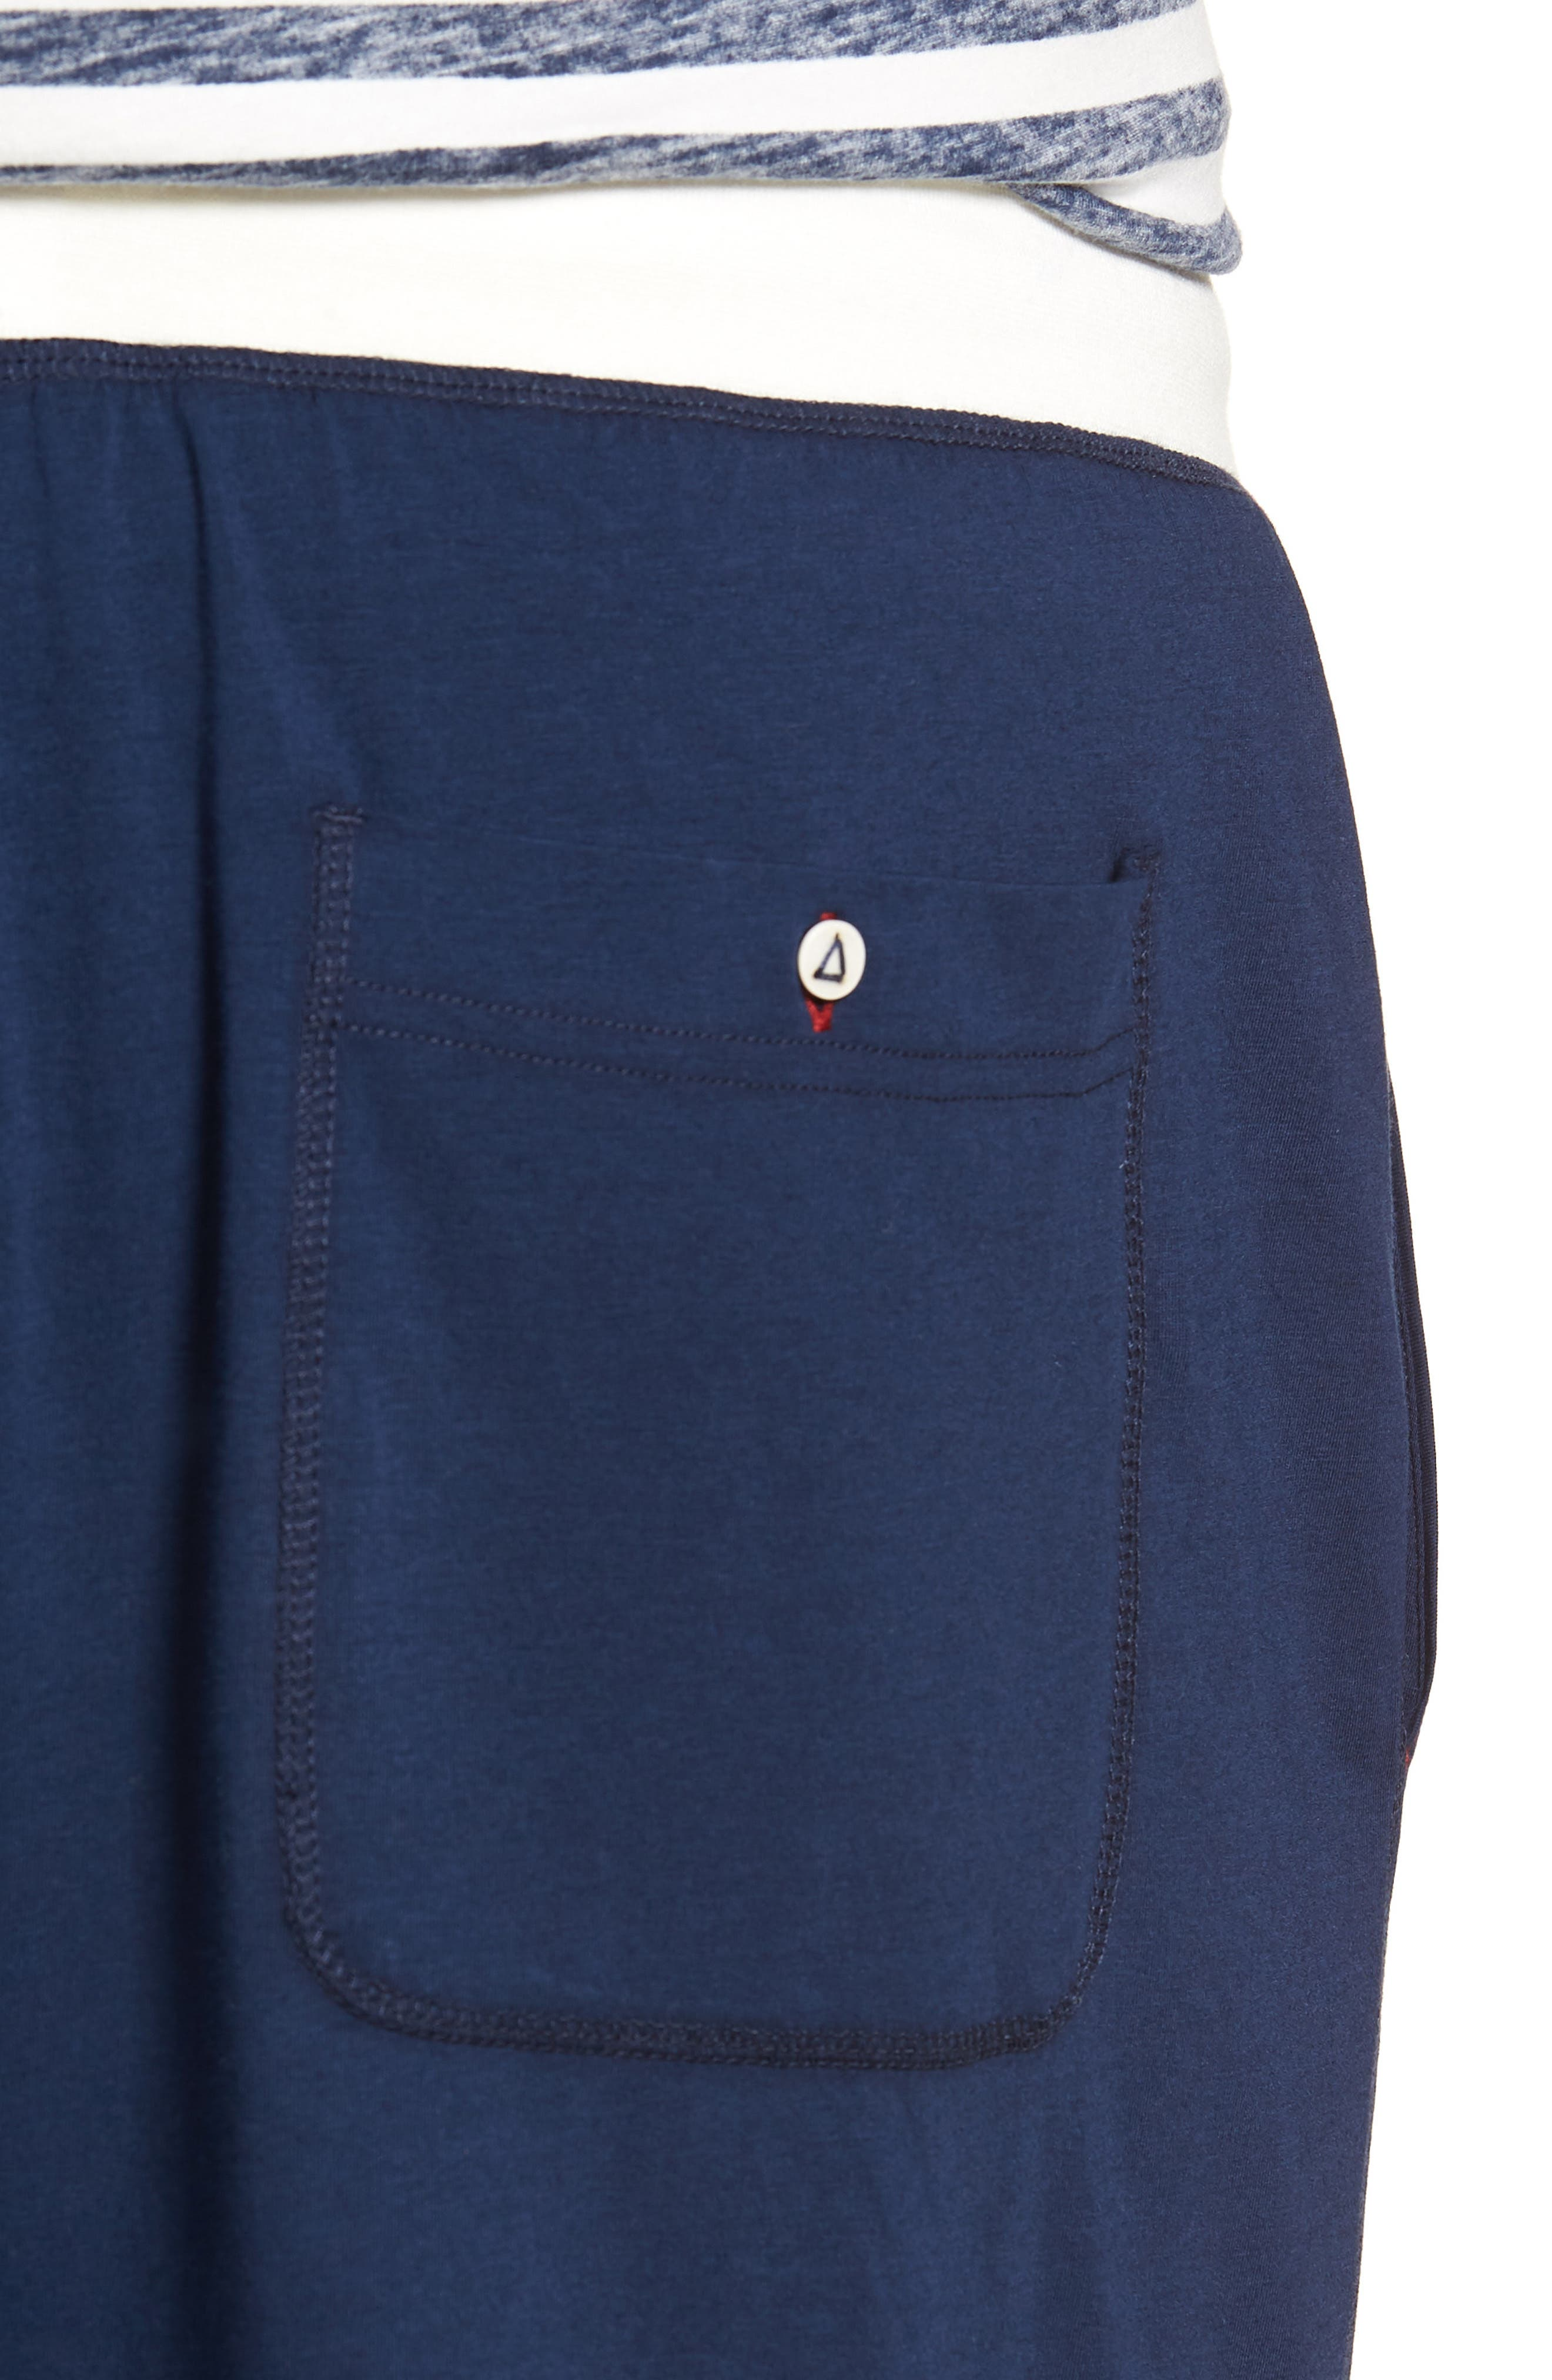 Stretch Cotton & Modal Blend Lounge Pants,                             Alternate thumbnail 4, color,                             NAVY